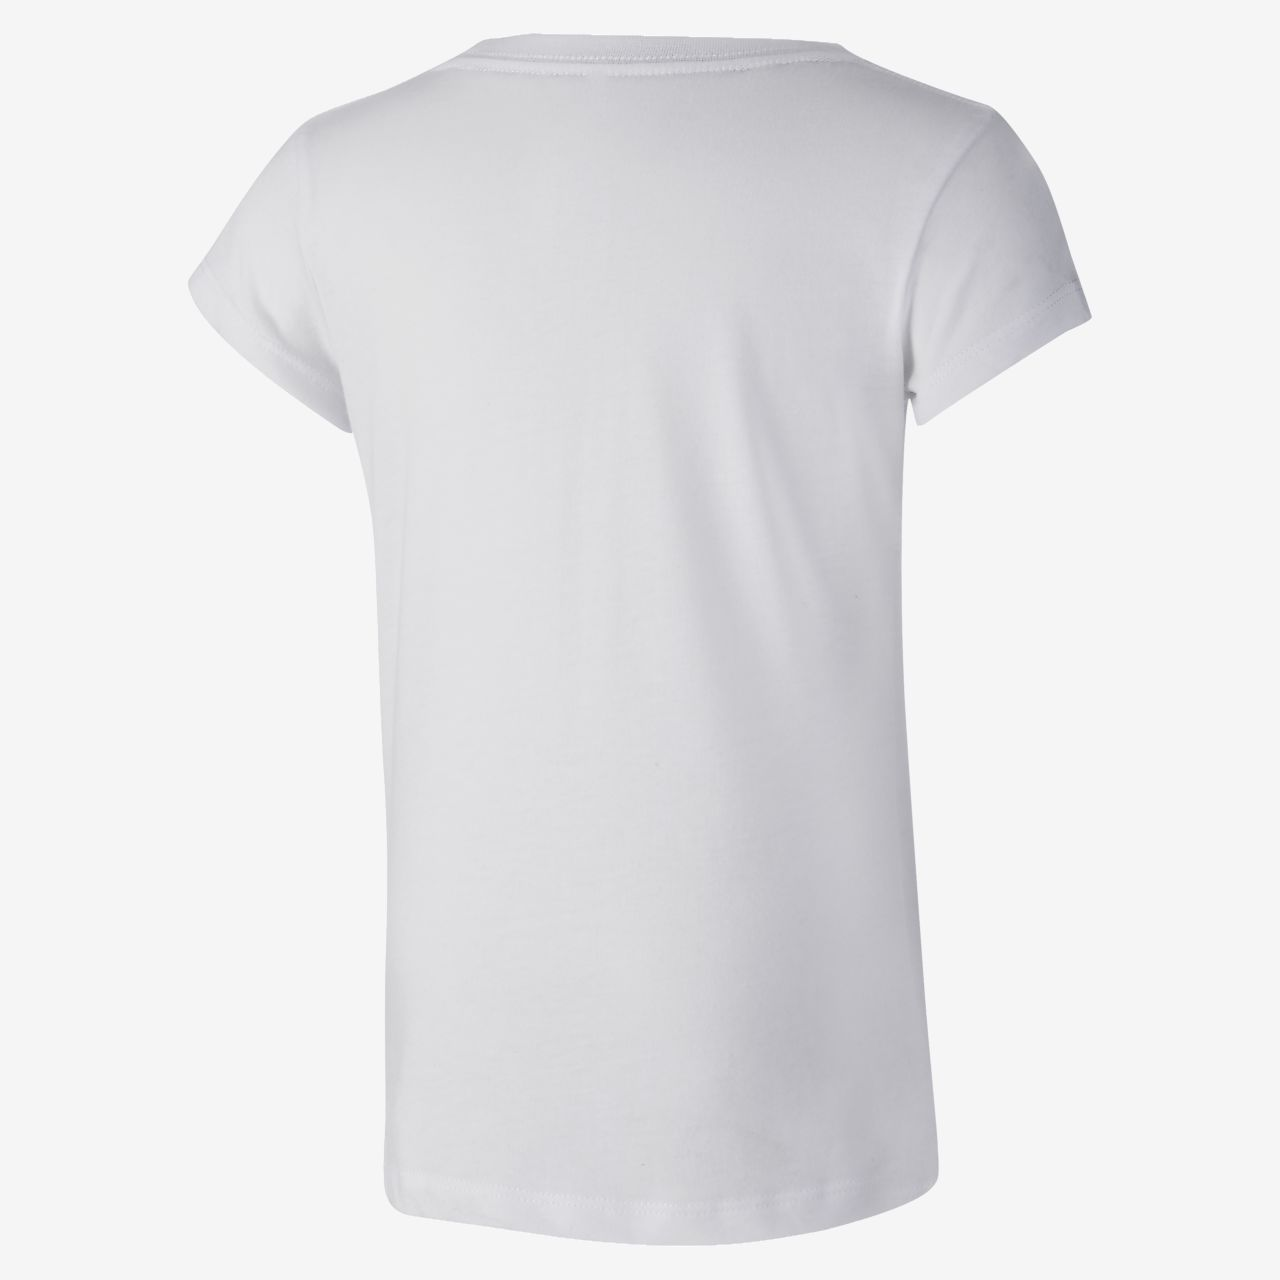 0daa5eff35fb2e Jordan 7 Graphic (3y-8y) Younger Girls  T-Shirt . Nike.com GB